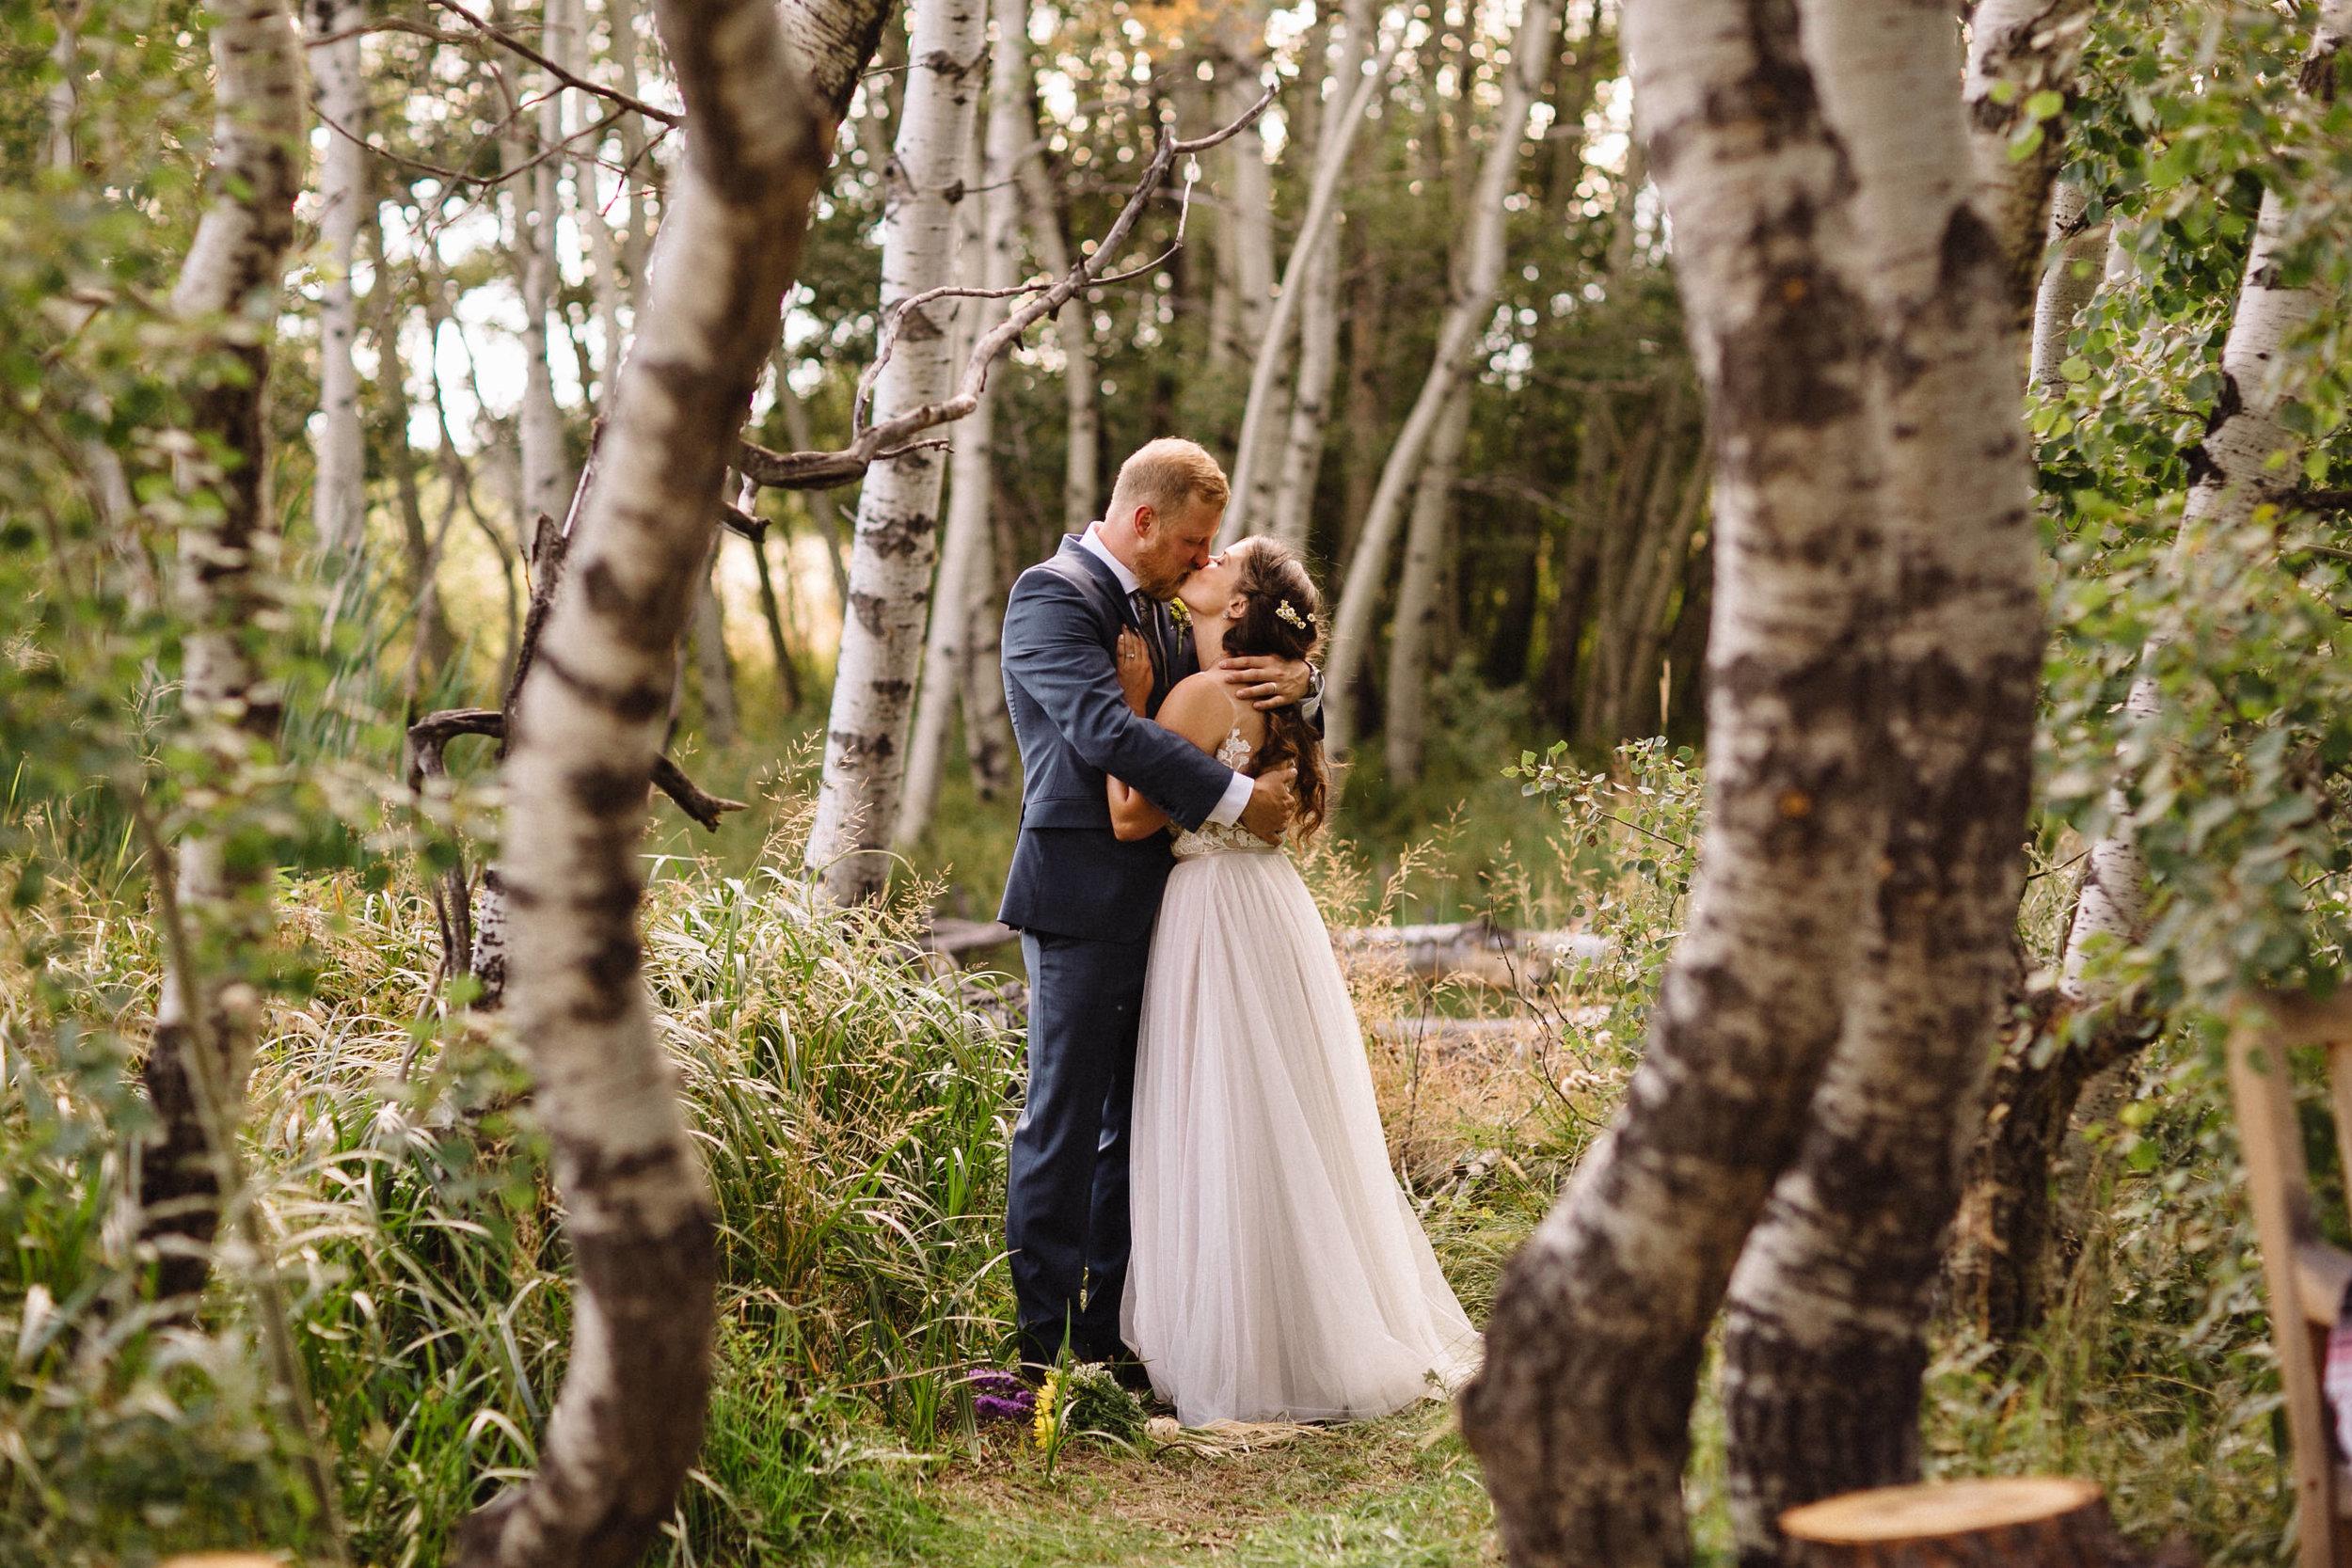 Liz Osban Photography Vedauwoo Buford Wyoming Happy Jack Wedding Elopement Destination Small Forest Cheyenne Laramie Medicine Bow National Forest Portraits Sarah Taylor7.jpg